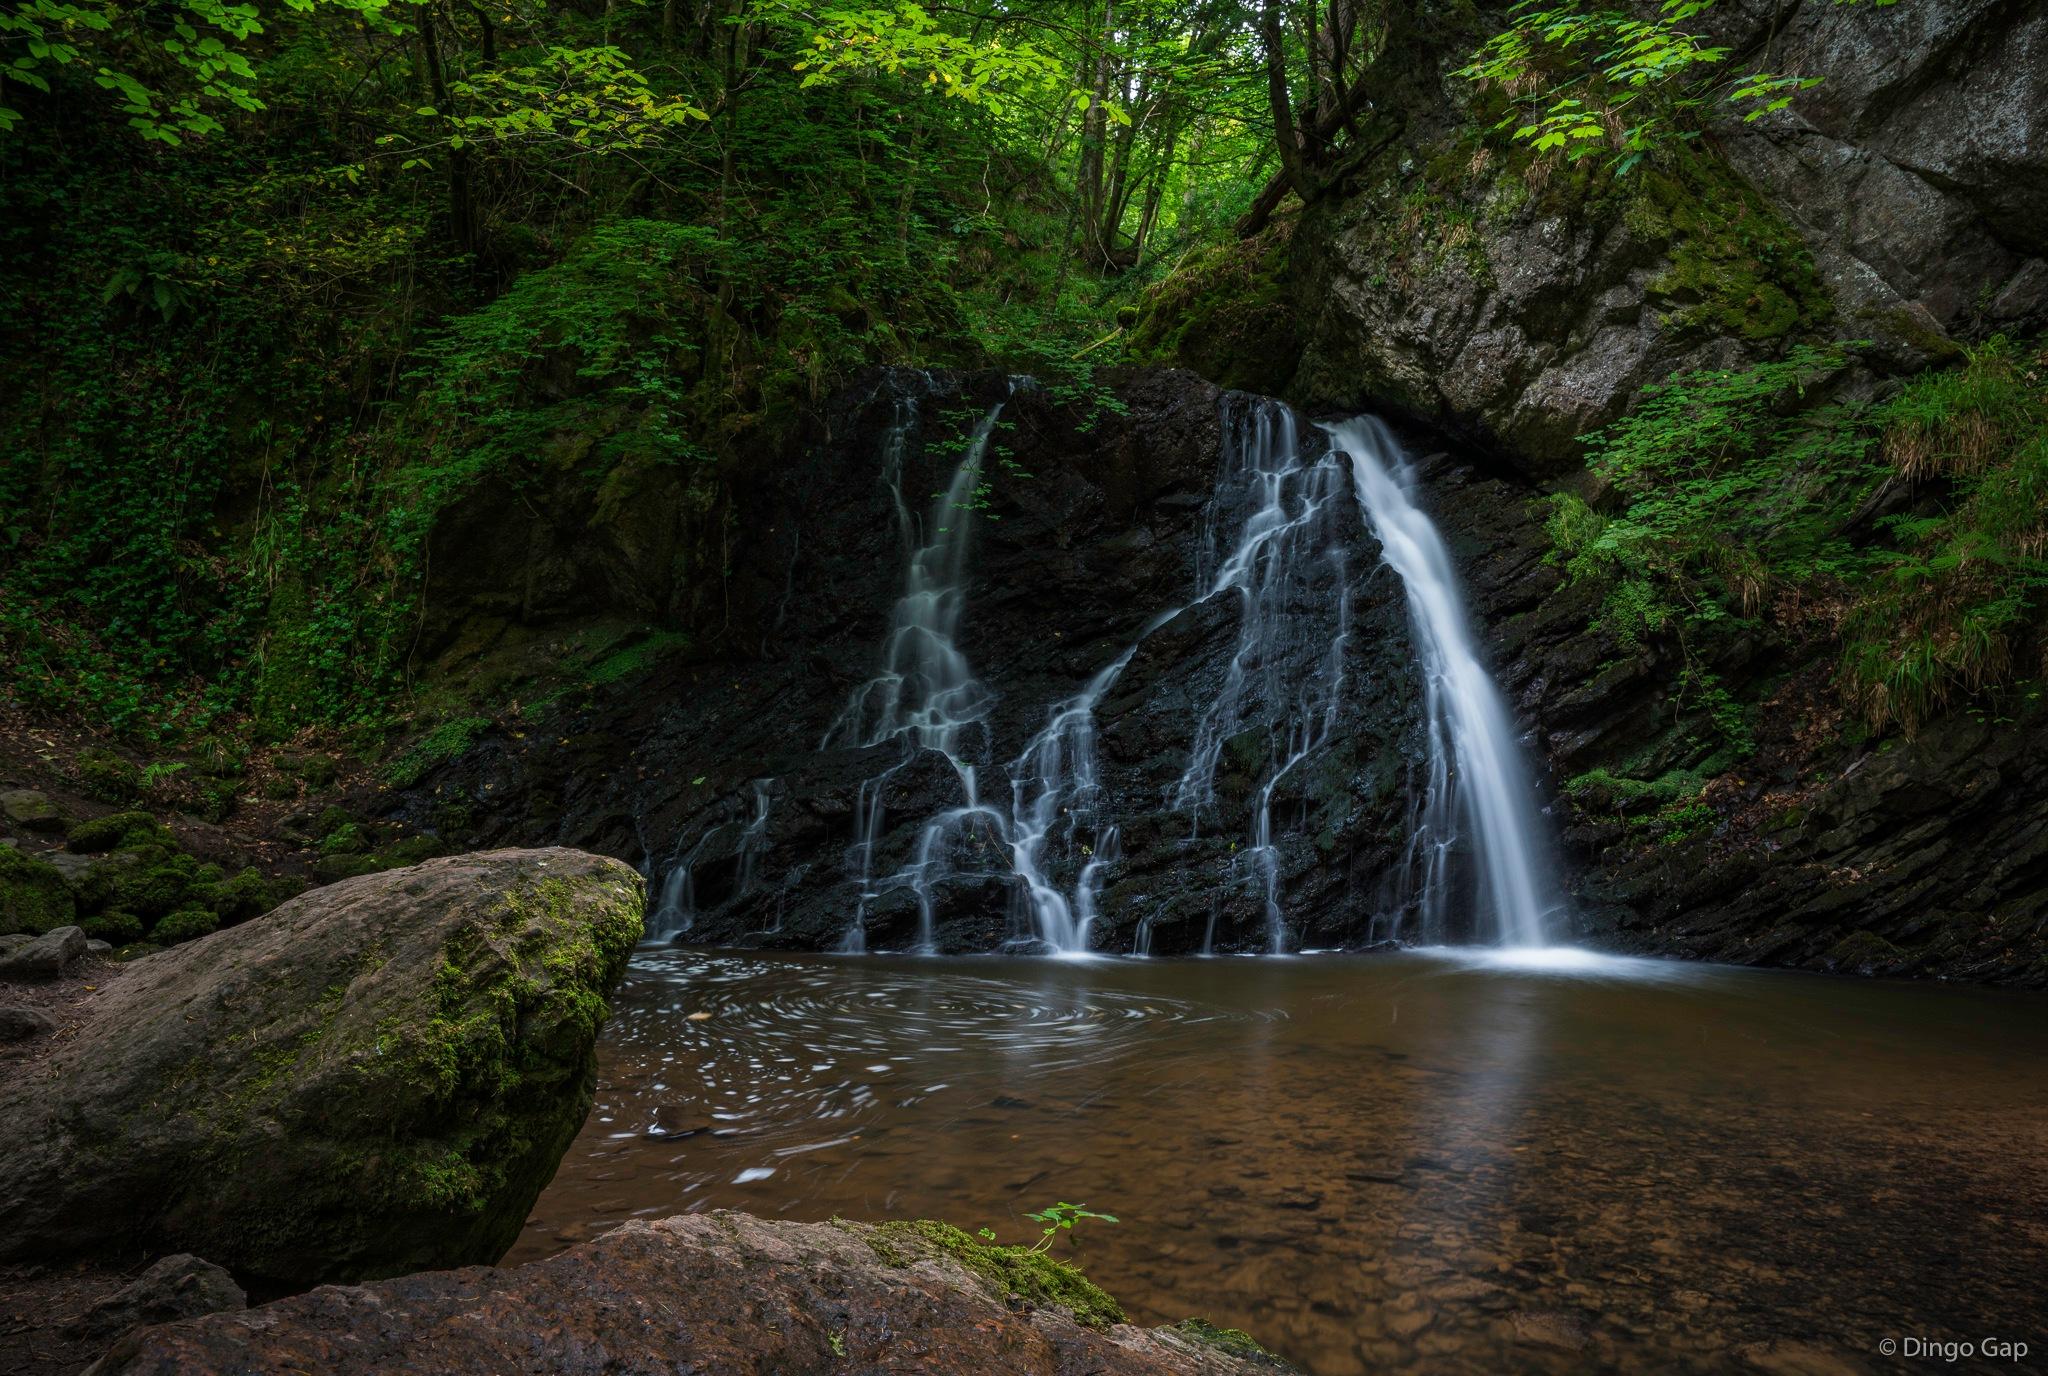 Rosemarkie Burn, Fairy Glen Falls, The Black Isle by Peter Medbury